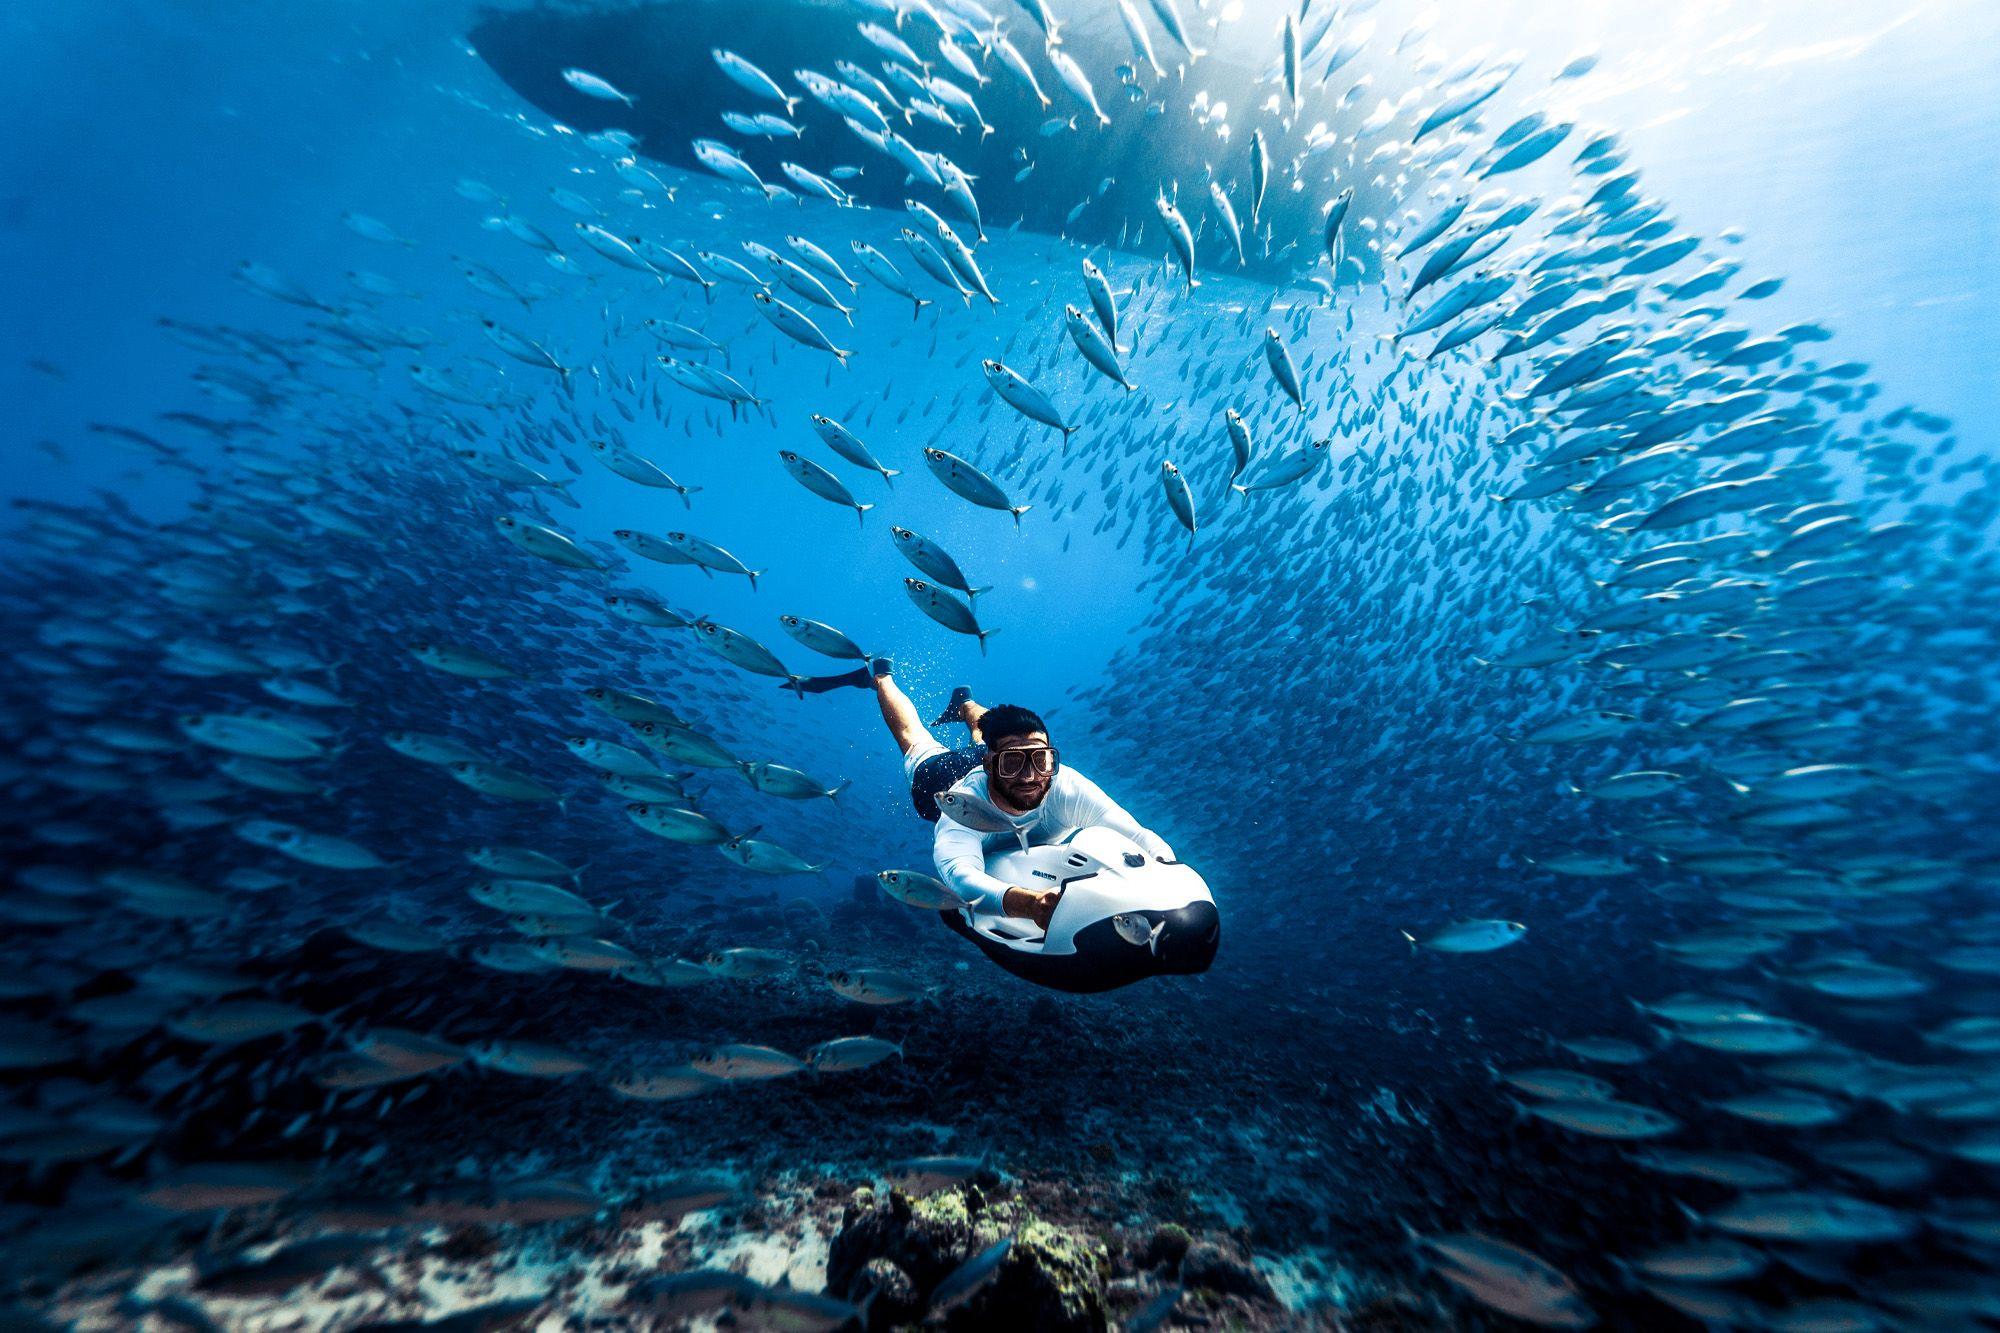 Curacao-Photos-2021---Water-Adventure--3-